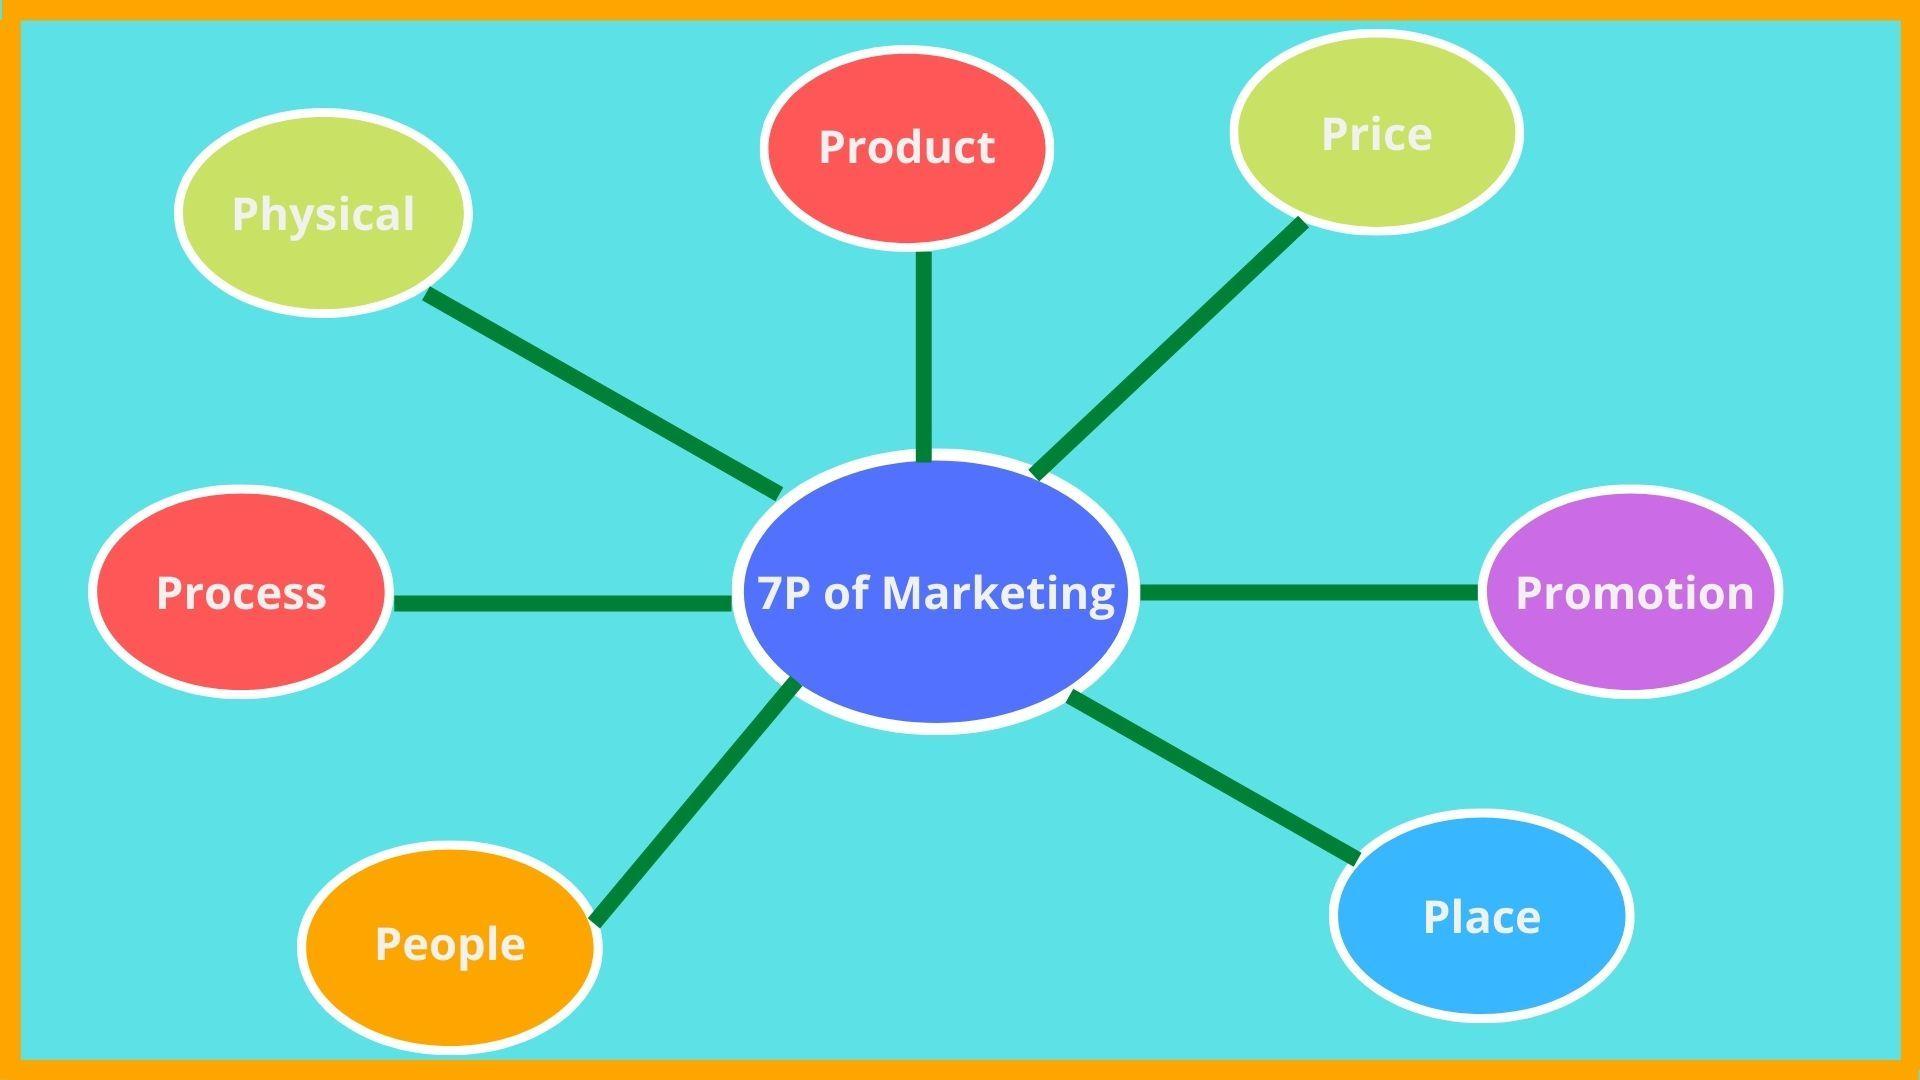 7P of Marketing